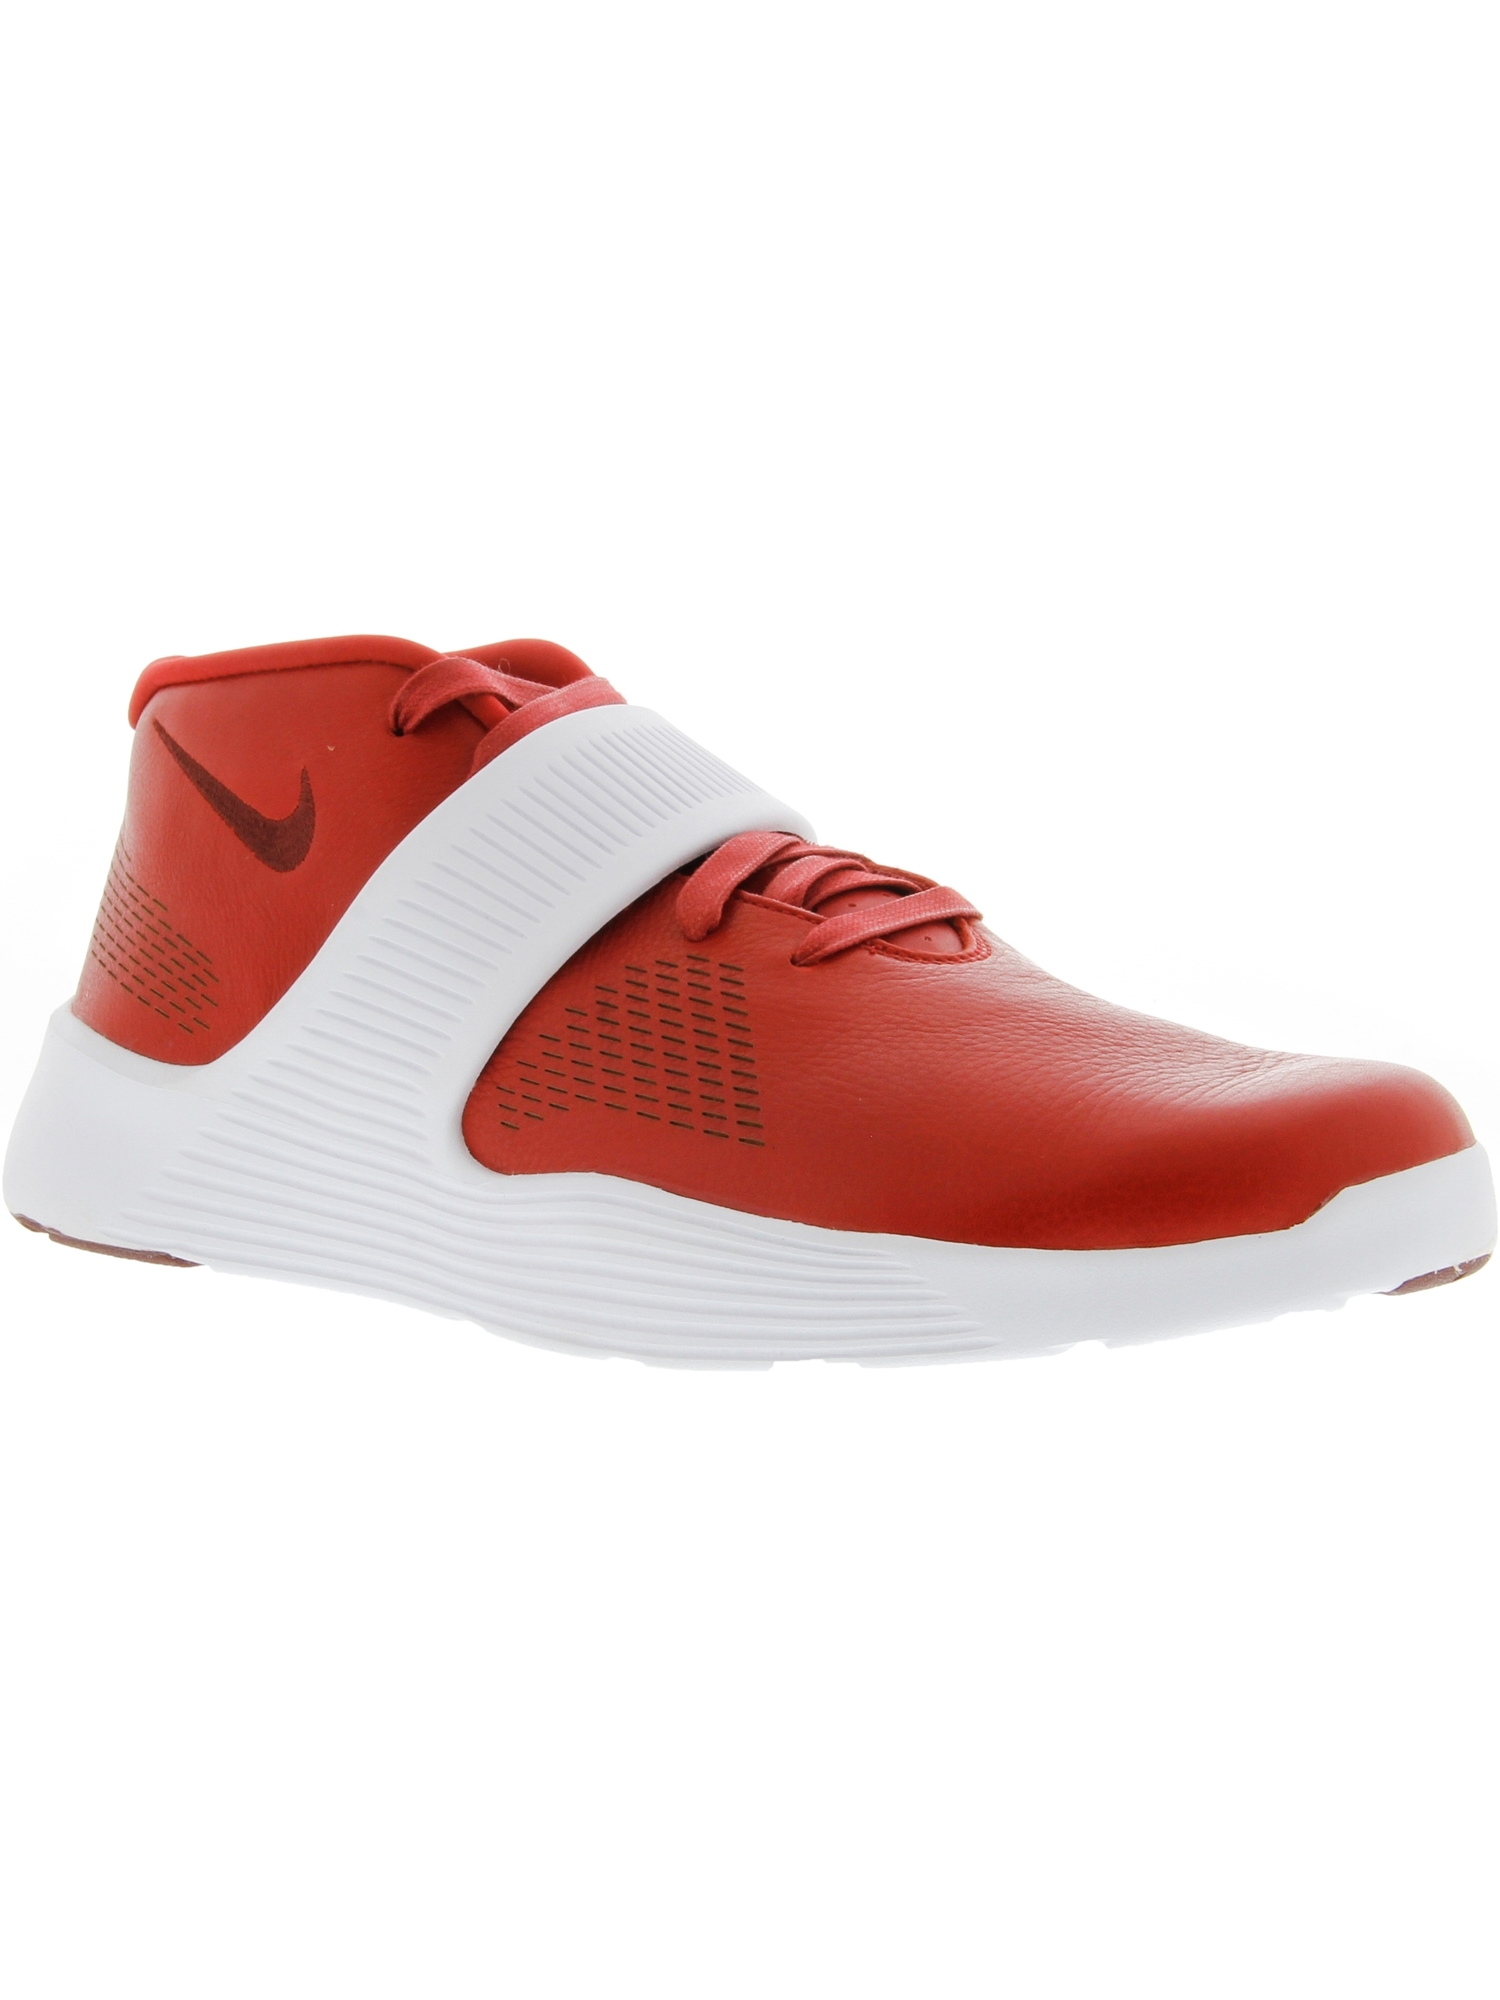 Nike Men's Ultra Xt Gym Red / Team